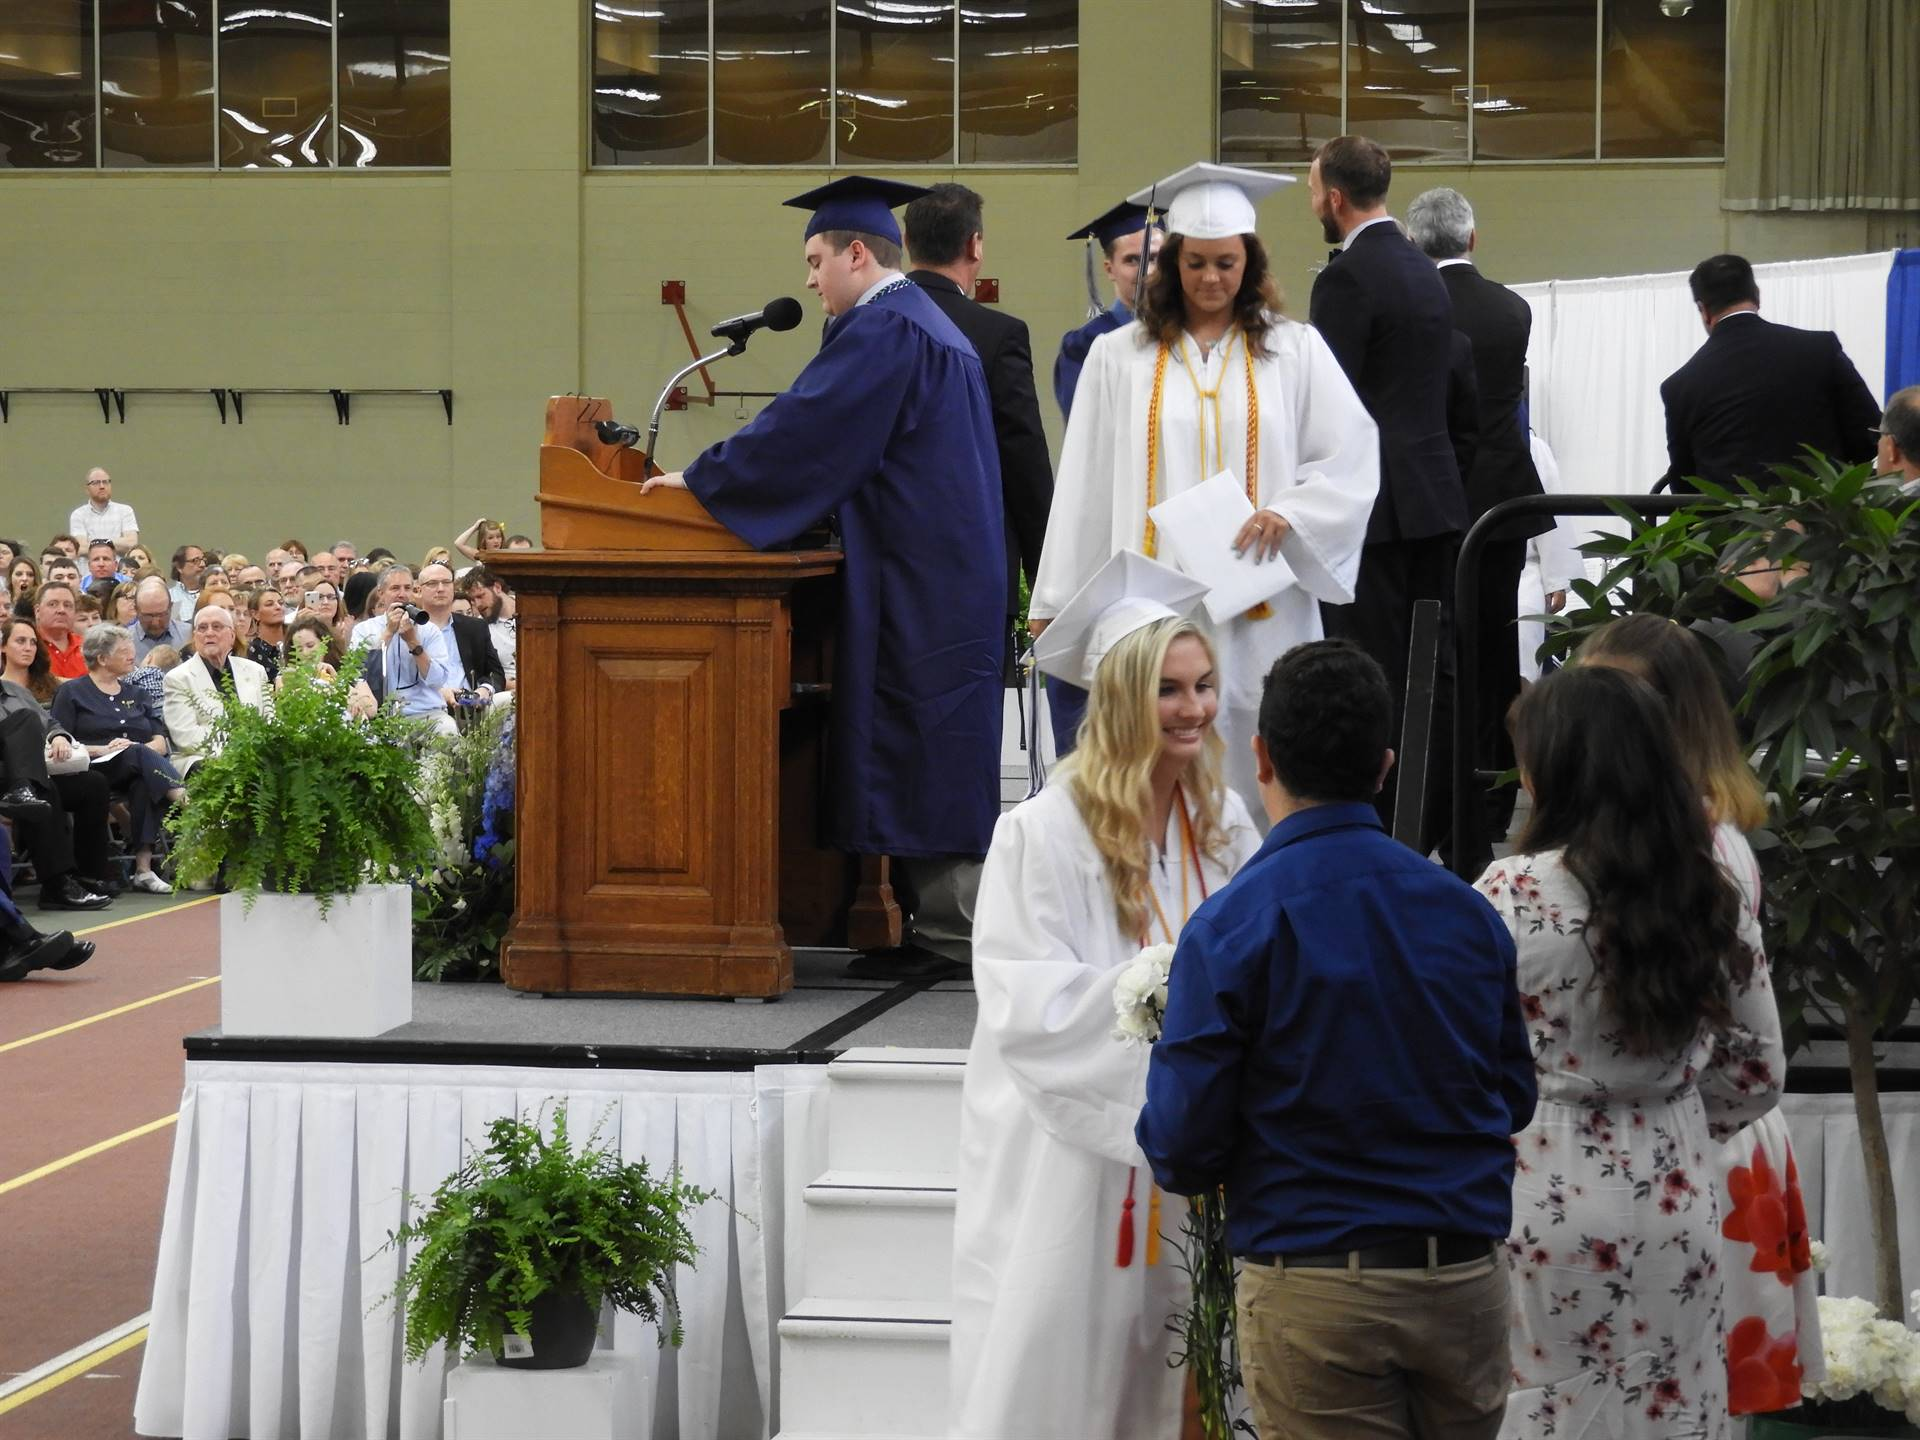 Class of 2018 - Presentation of Diplomas